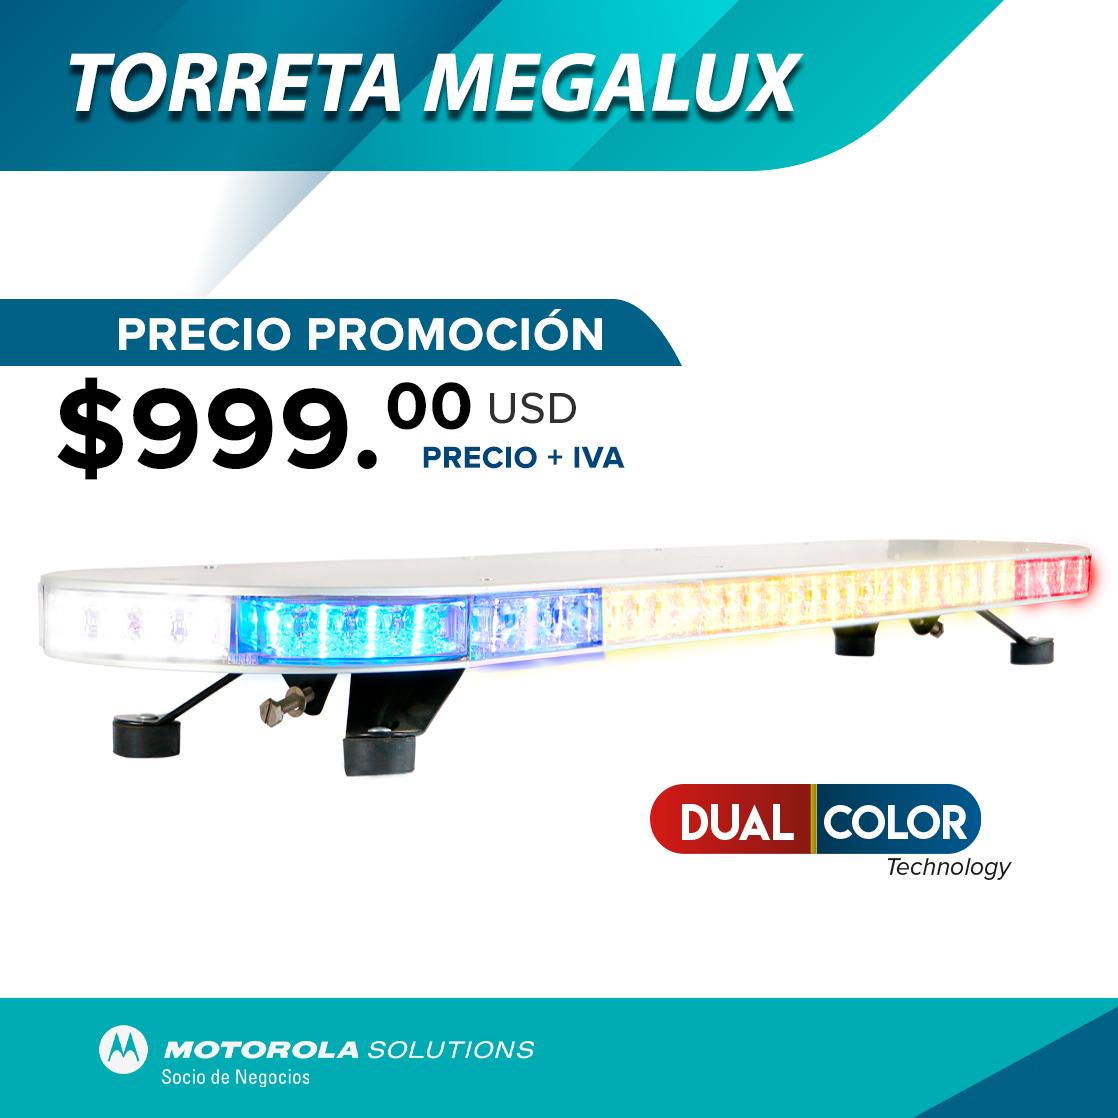 Torreta Megalux Dual Color